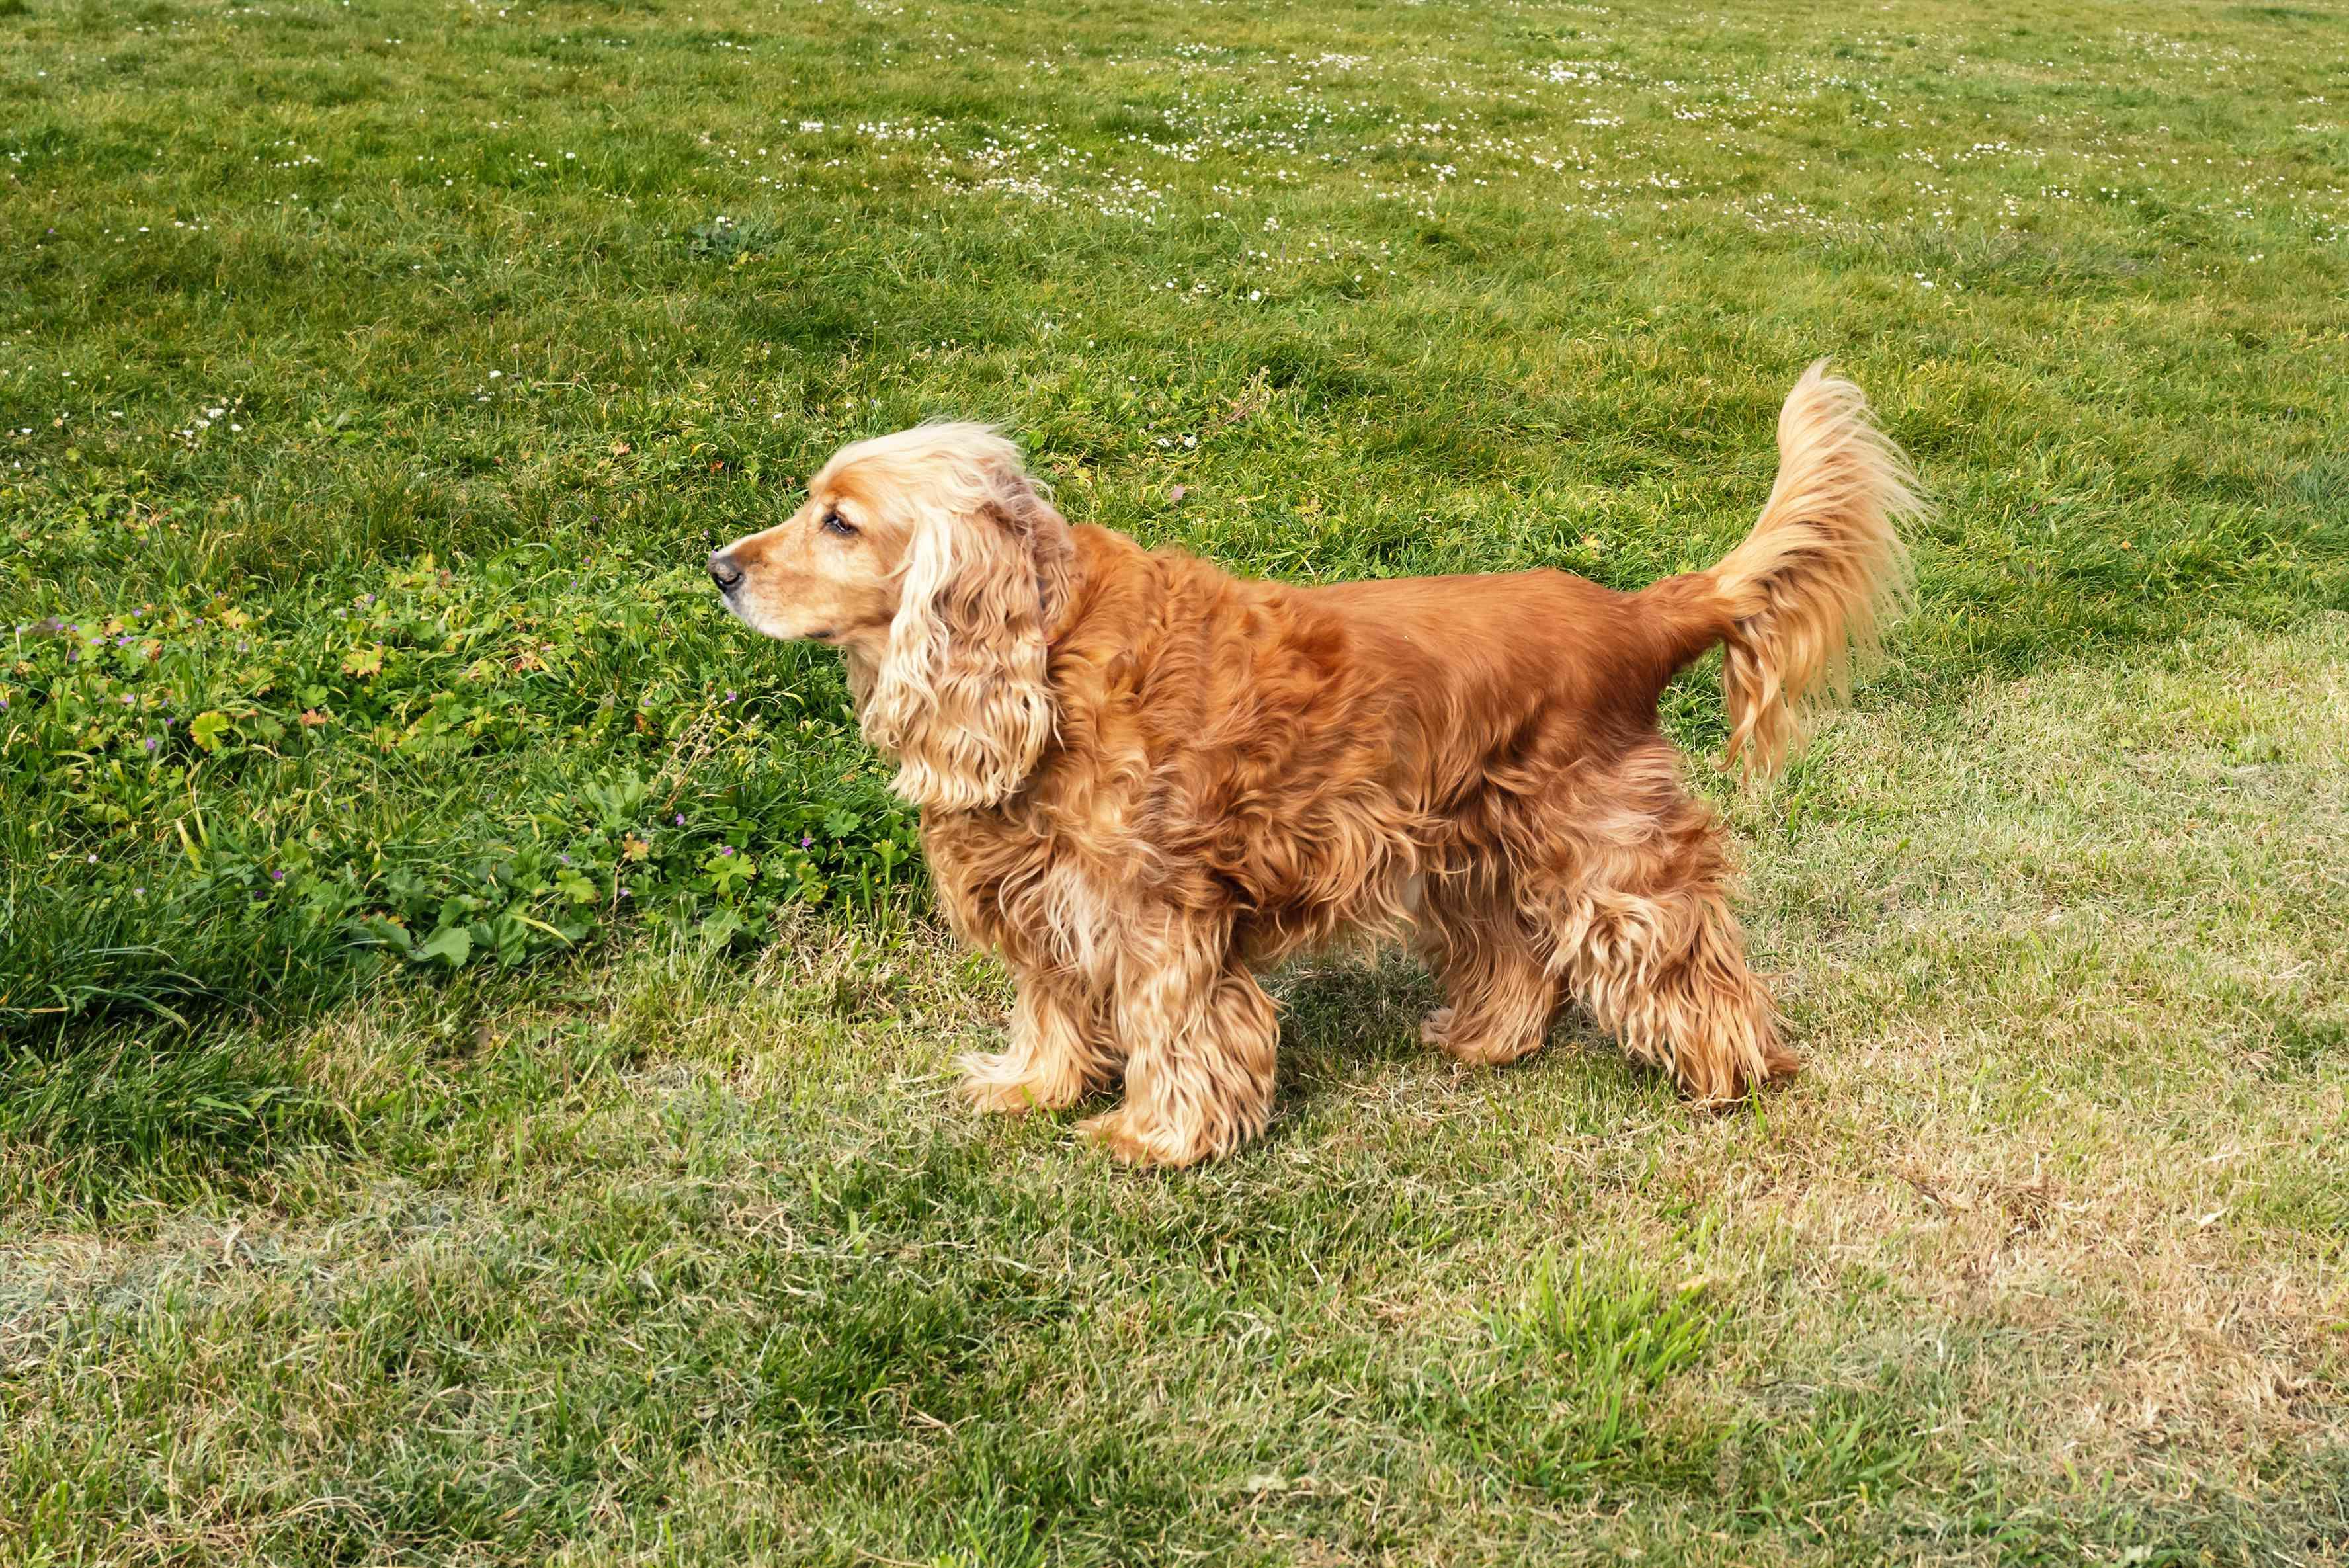 Cocker Spaniel standing in profile on grass